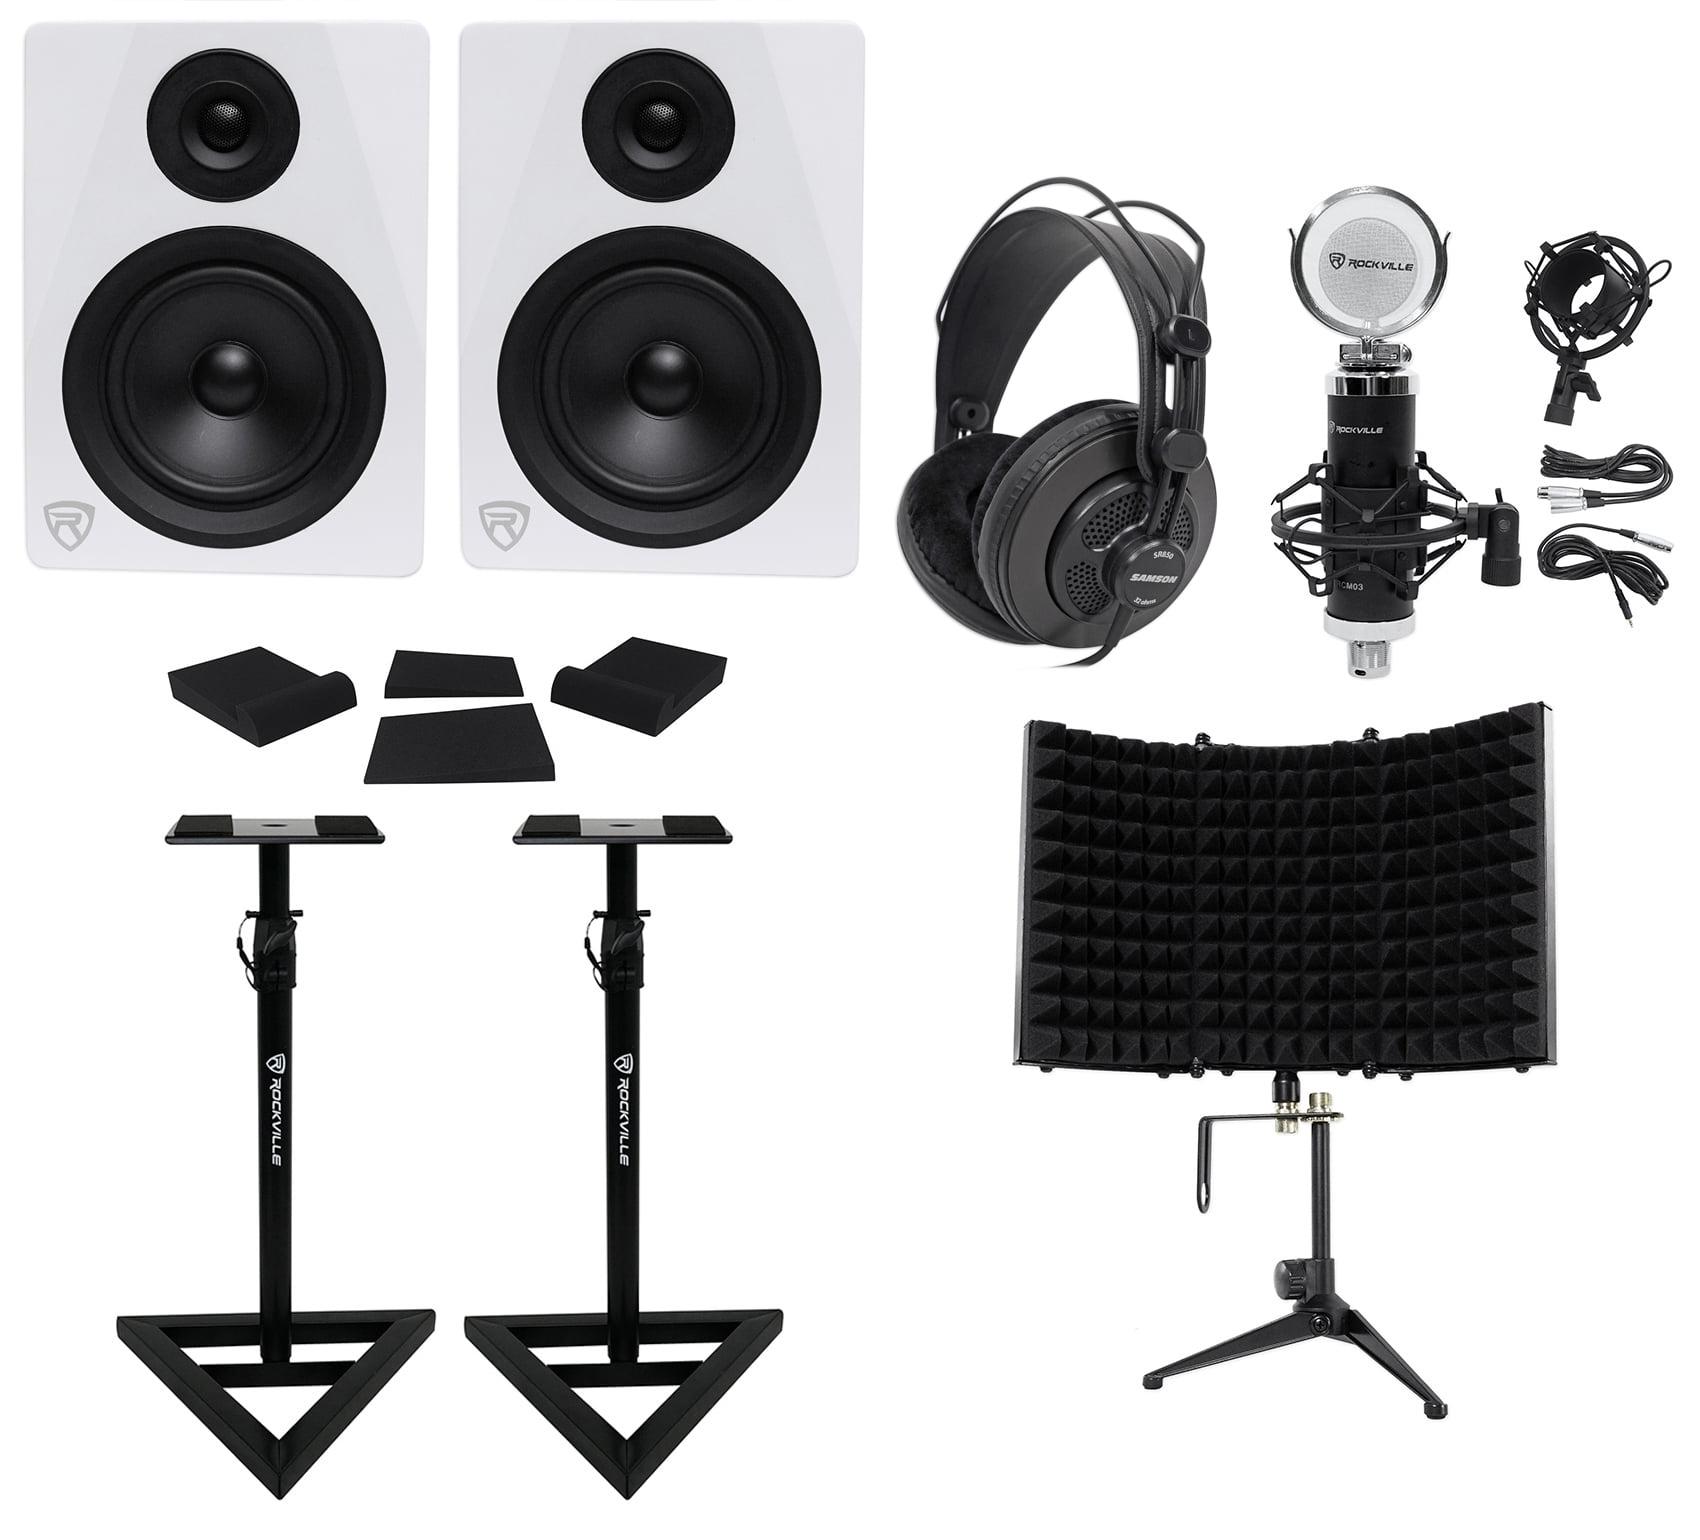 "2 Rockville DPM5W 5.25"" 300w Active Studio Monitors+Stands+Headphones+Mic+Shield by ROCKVILLE"